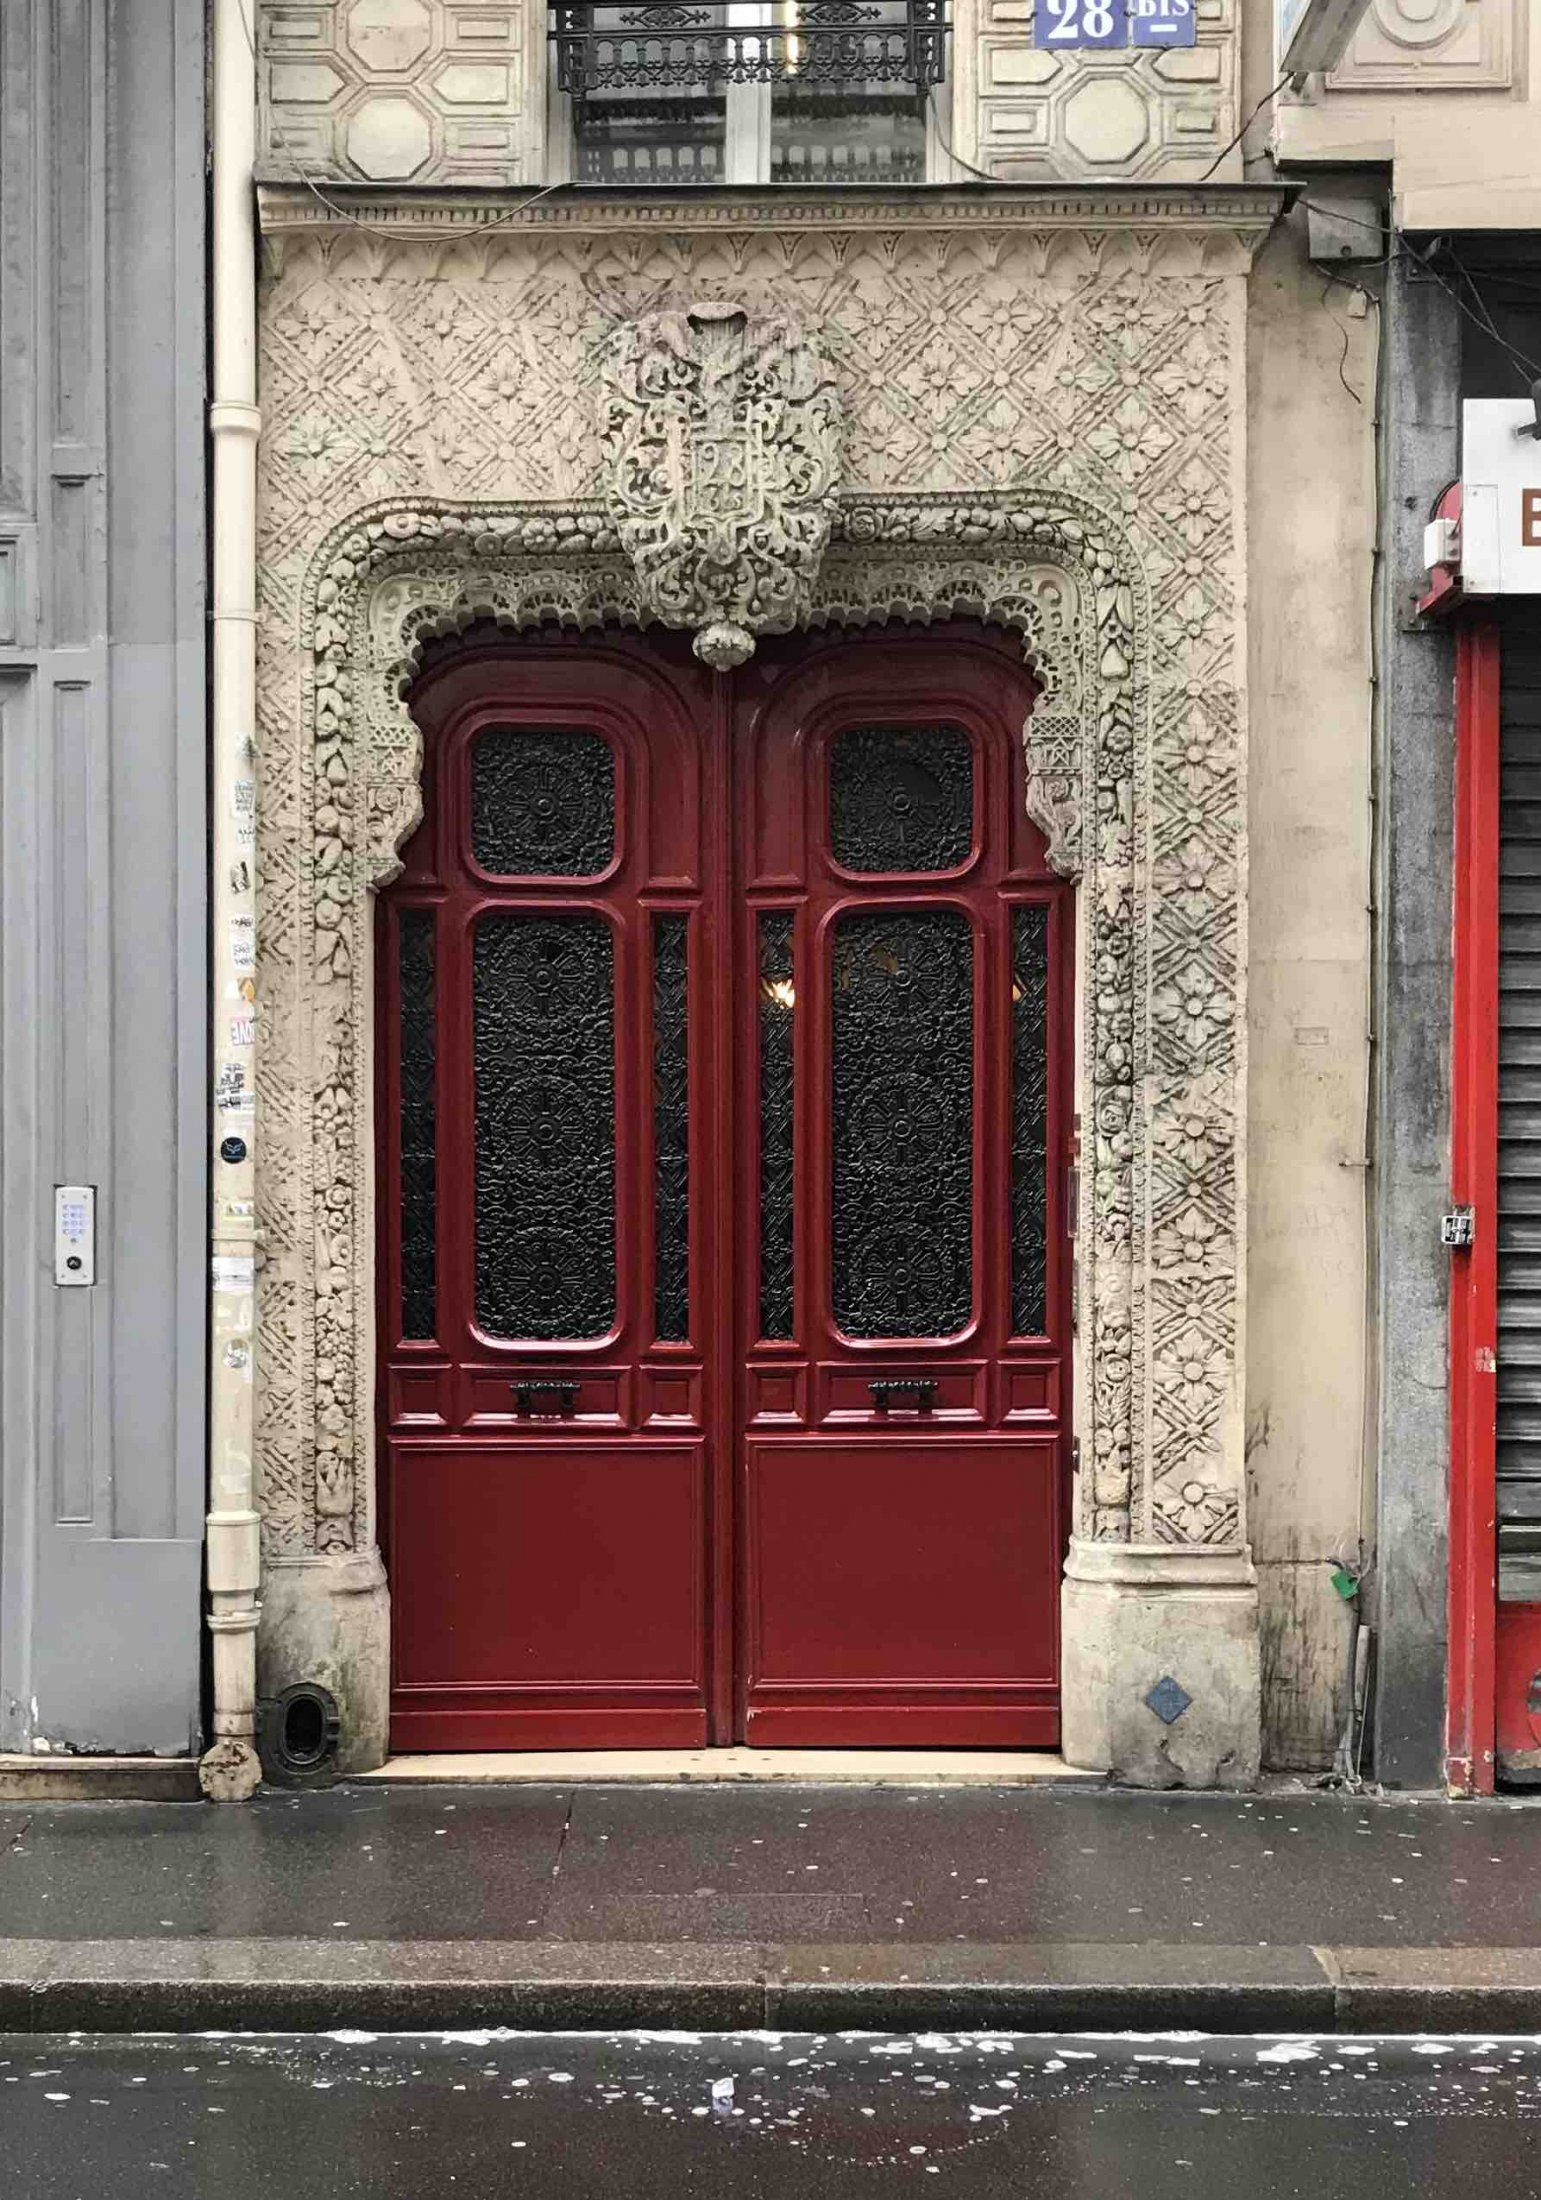 28BIS RUE RICHELIEU PARIS 1